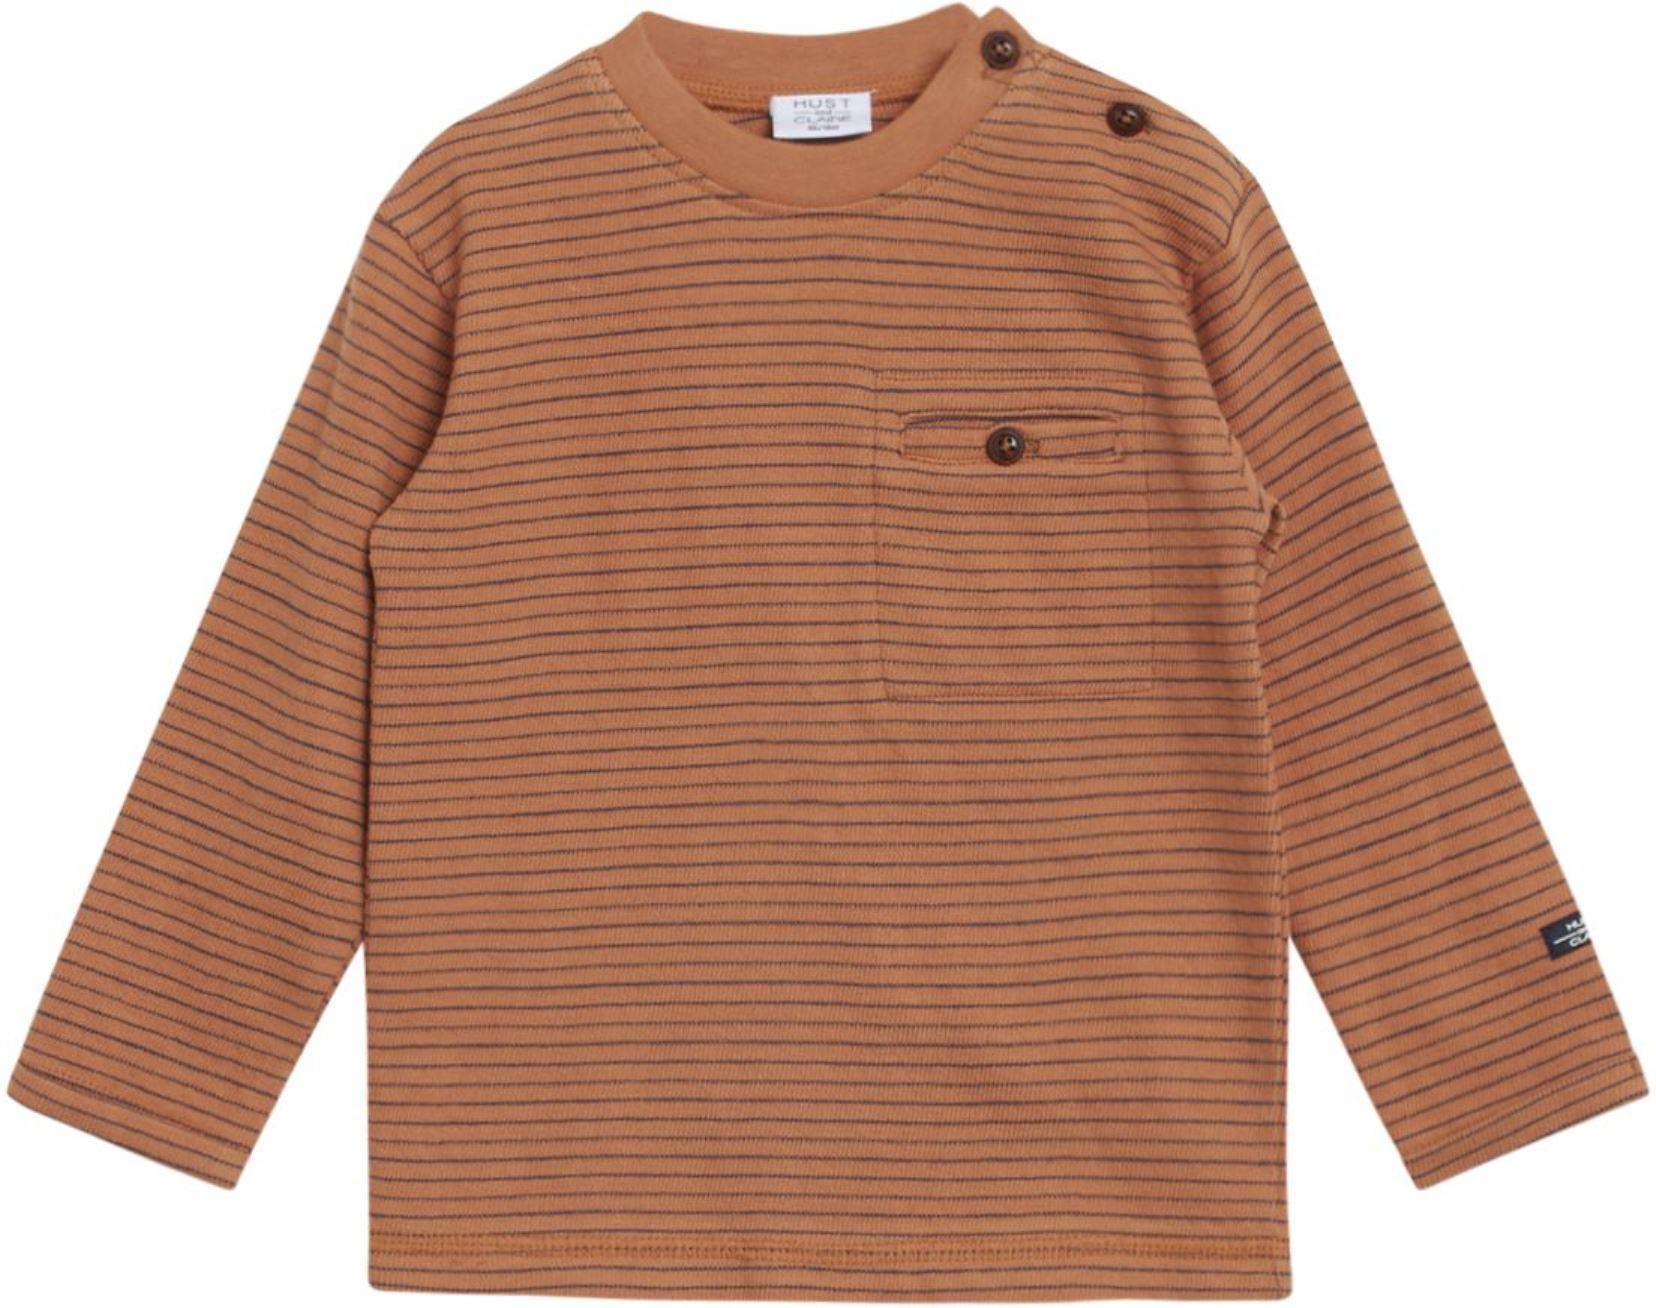 Hust & Claire Boy Sweatshirt Stripe leather